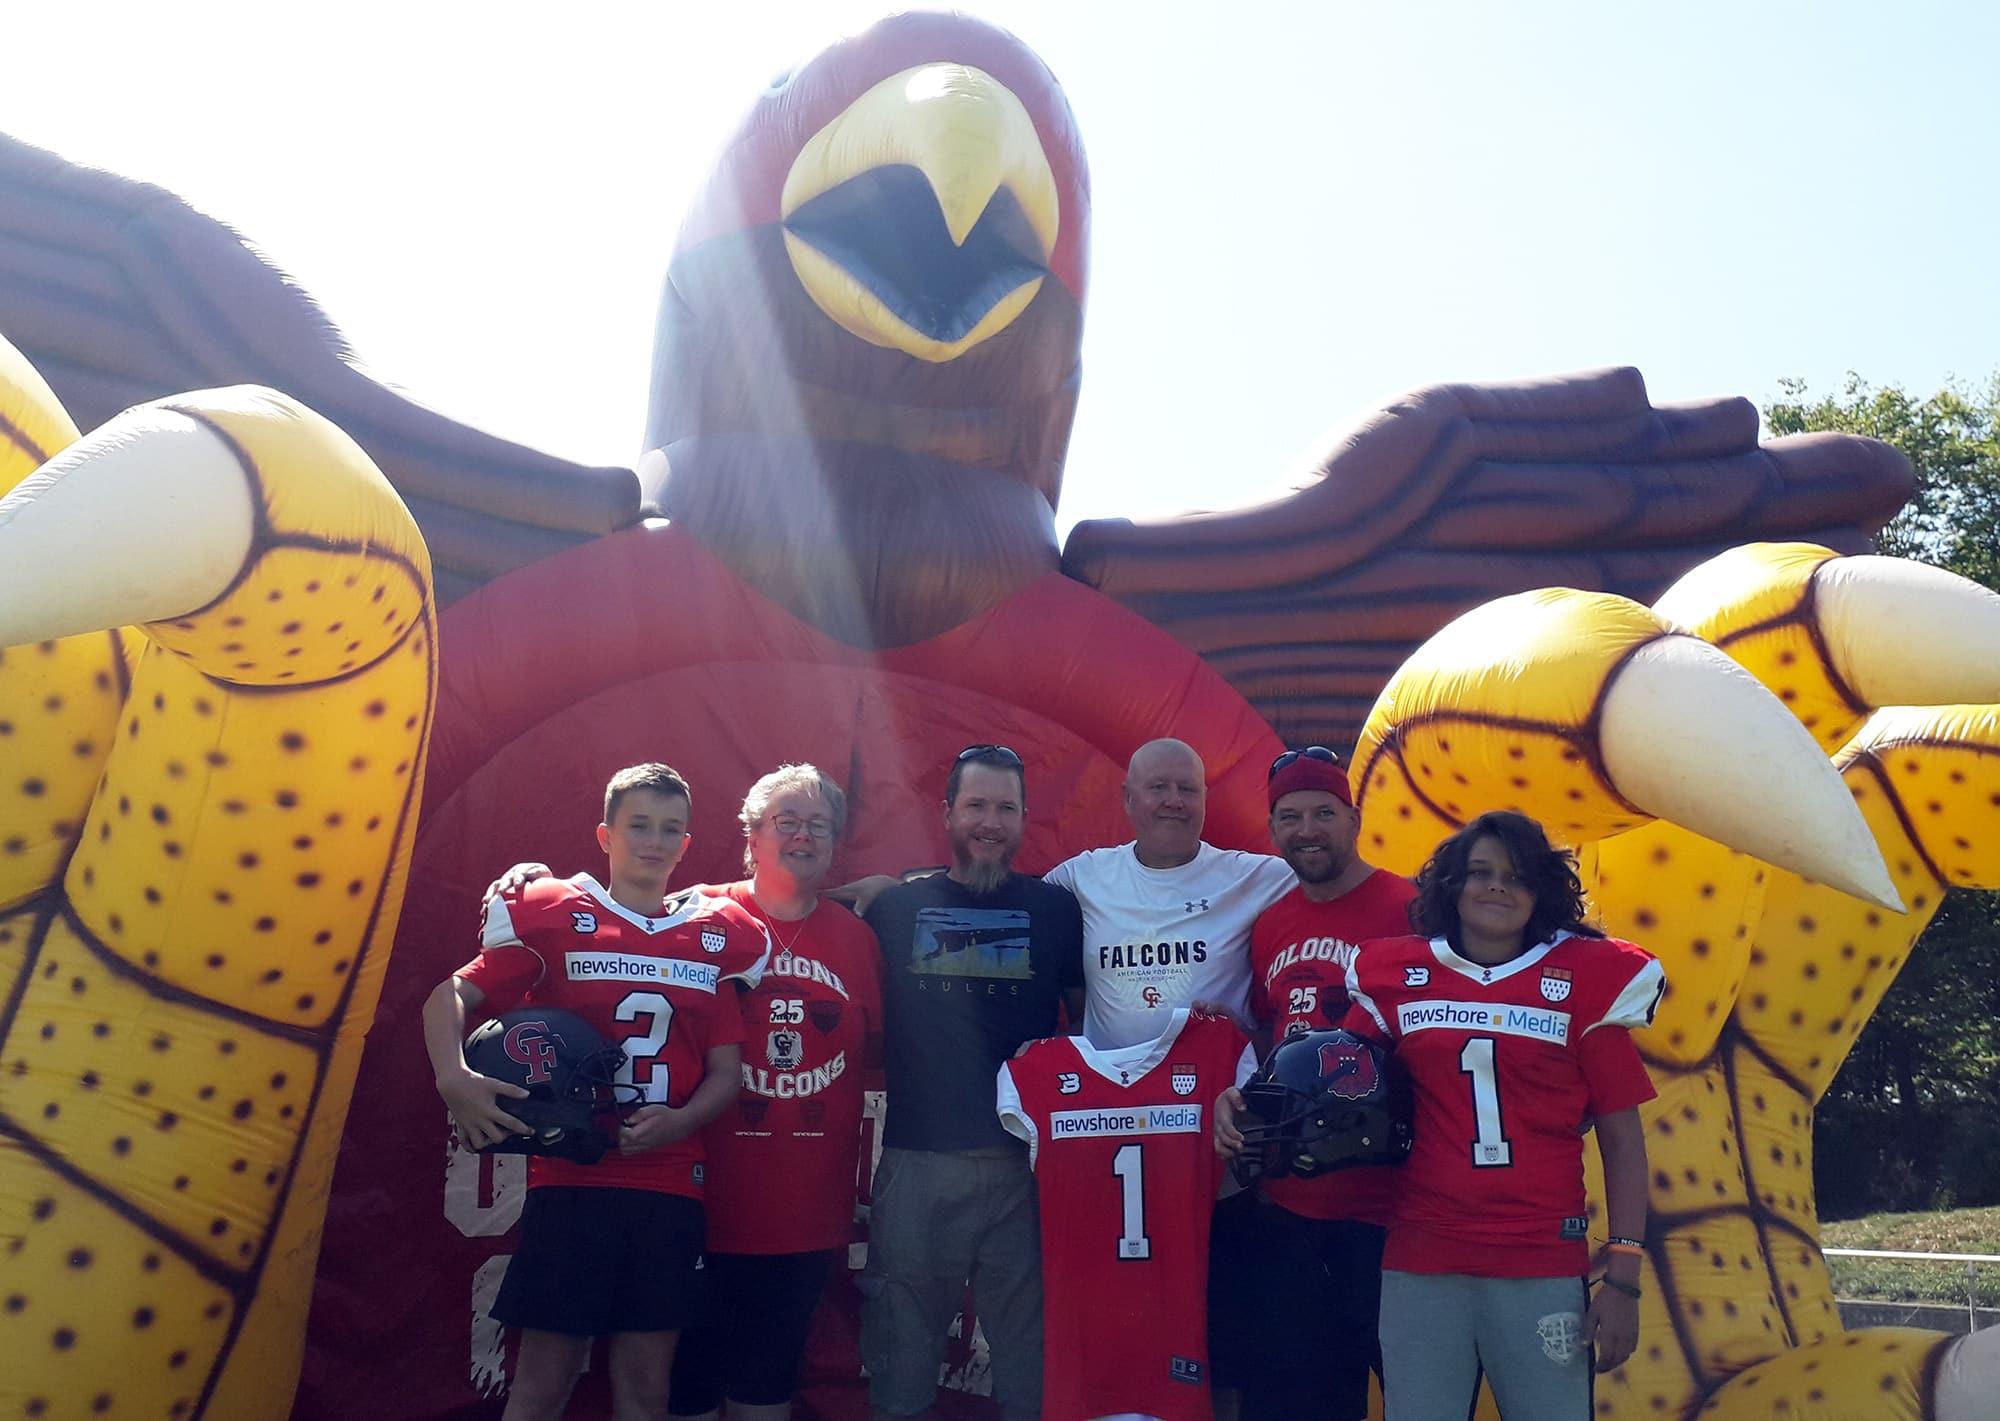 Trikotsponsor des U13-Teams der Cologne Falcons